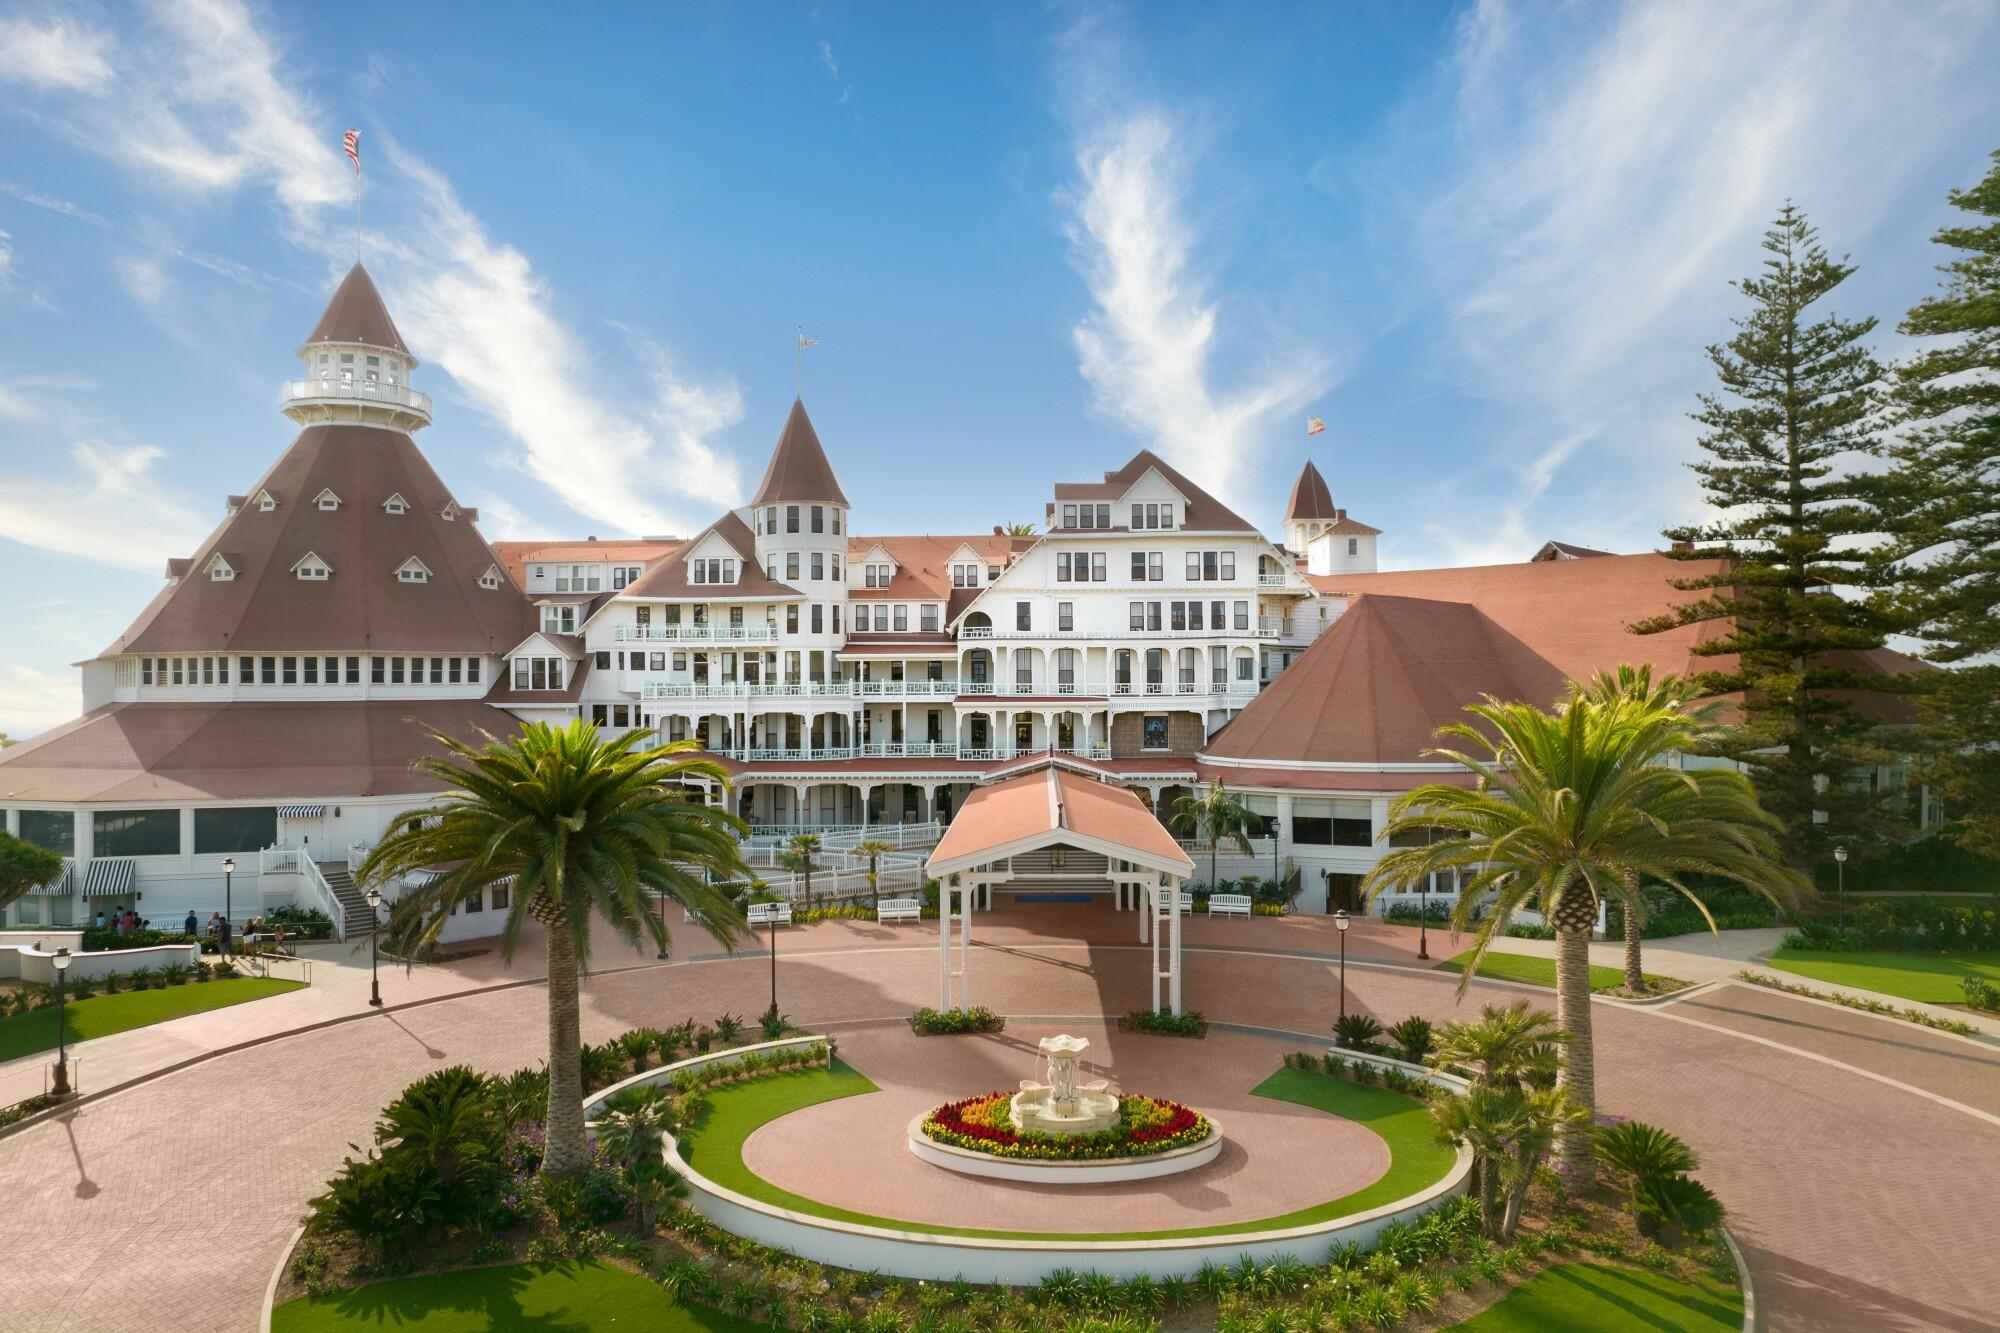 New entrance to the Hotel Del Coronado